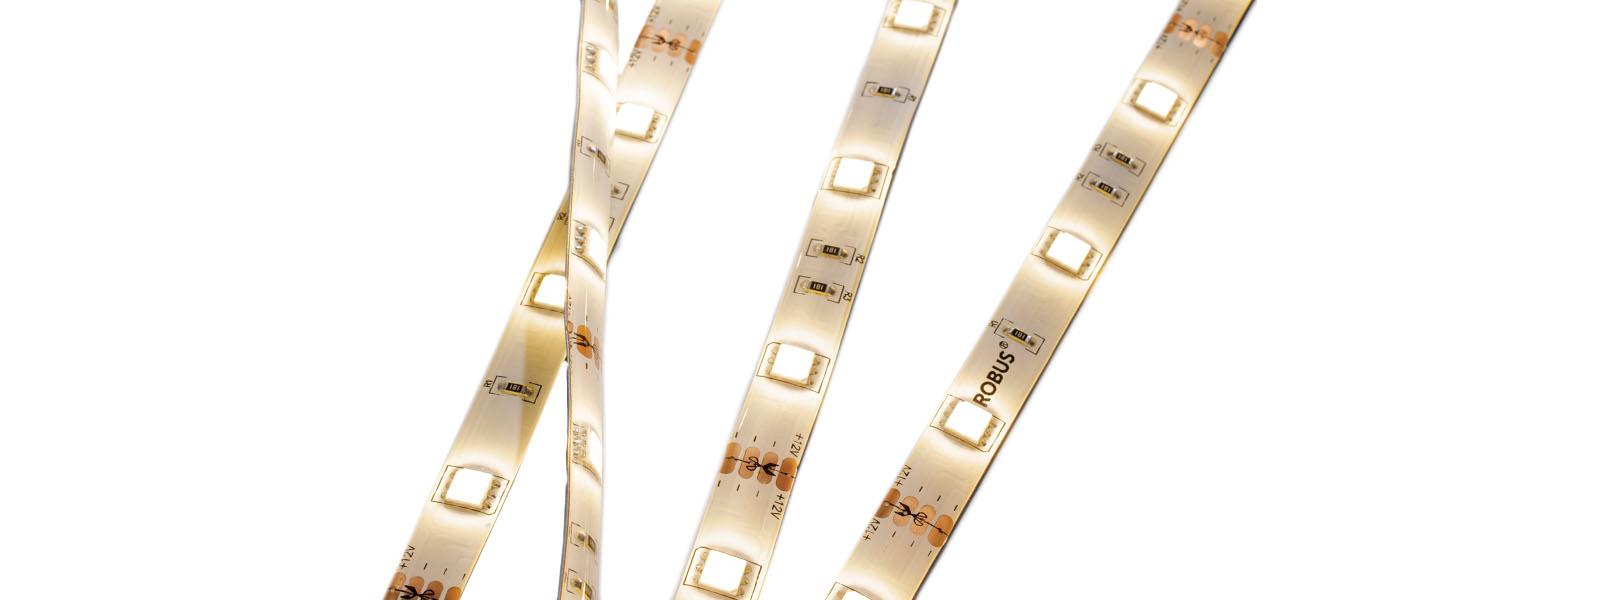 Display & LED Flexi-Strips